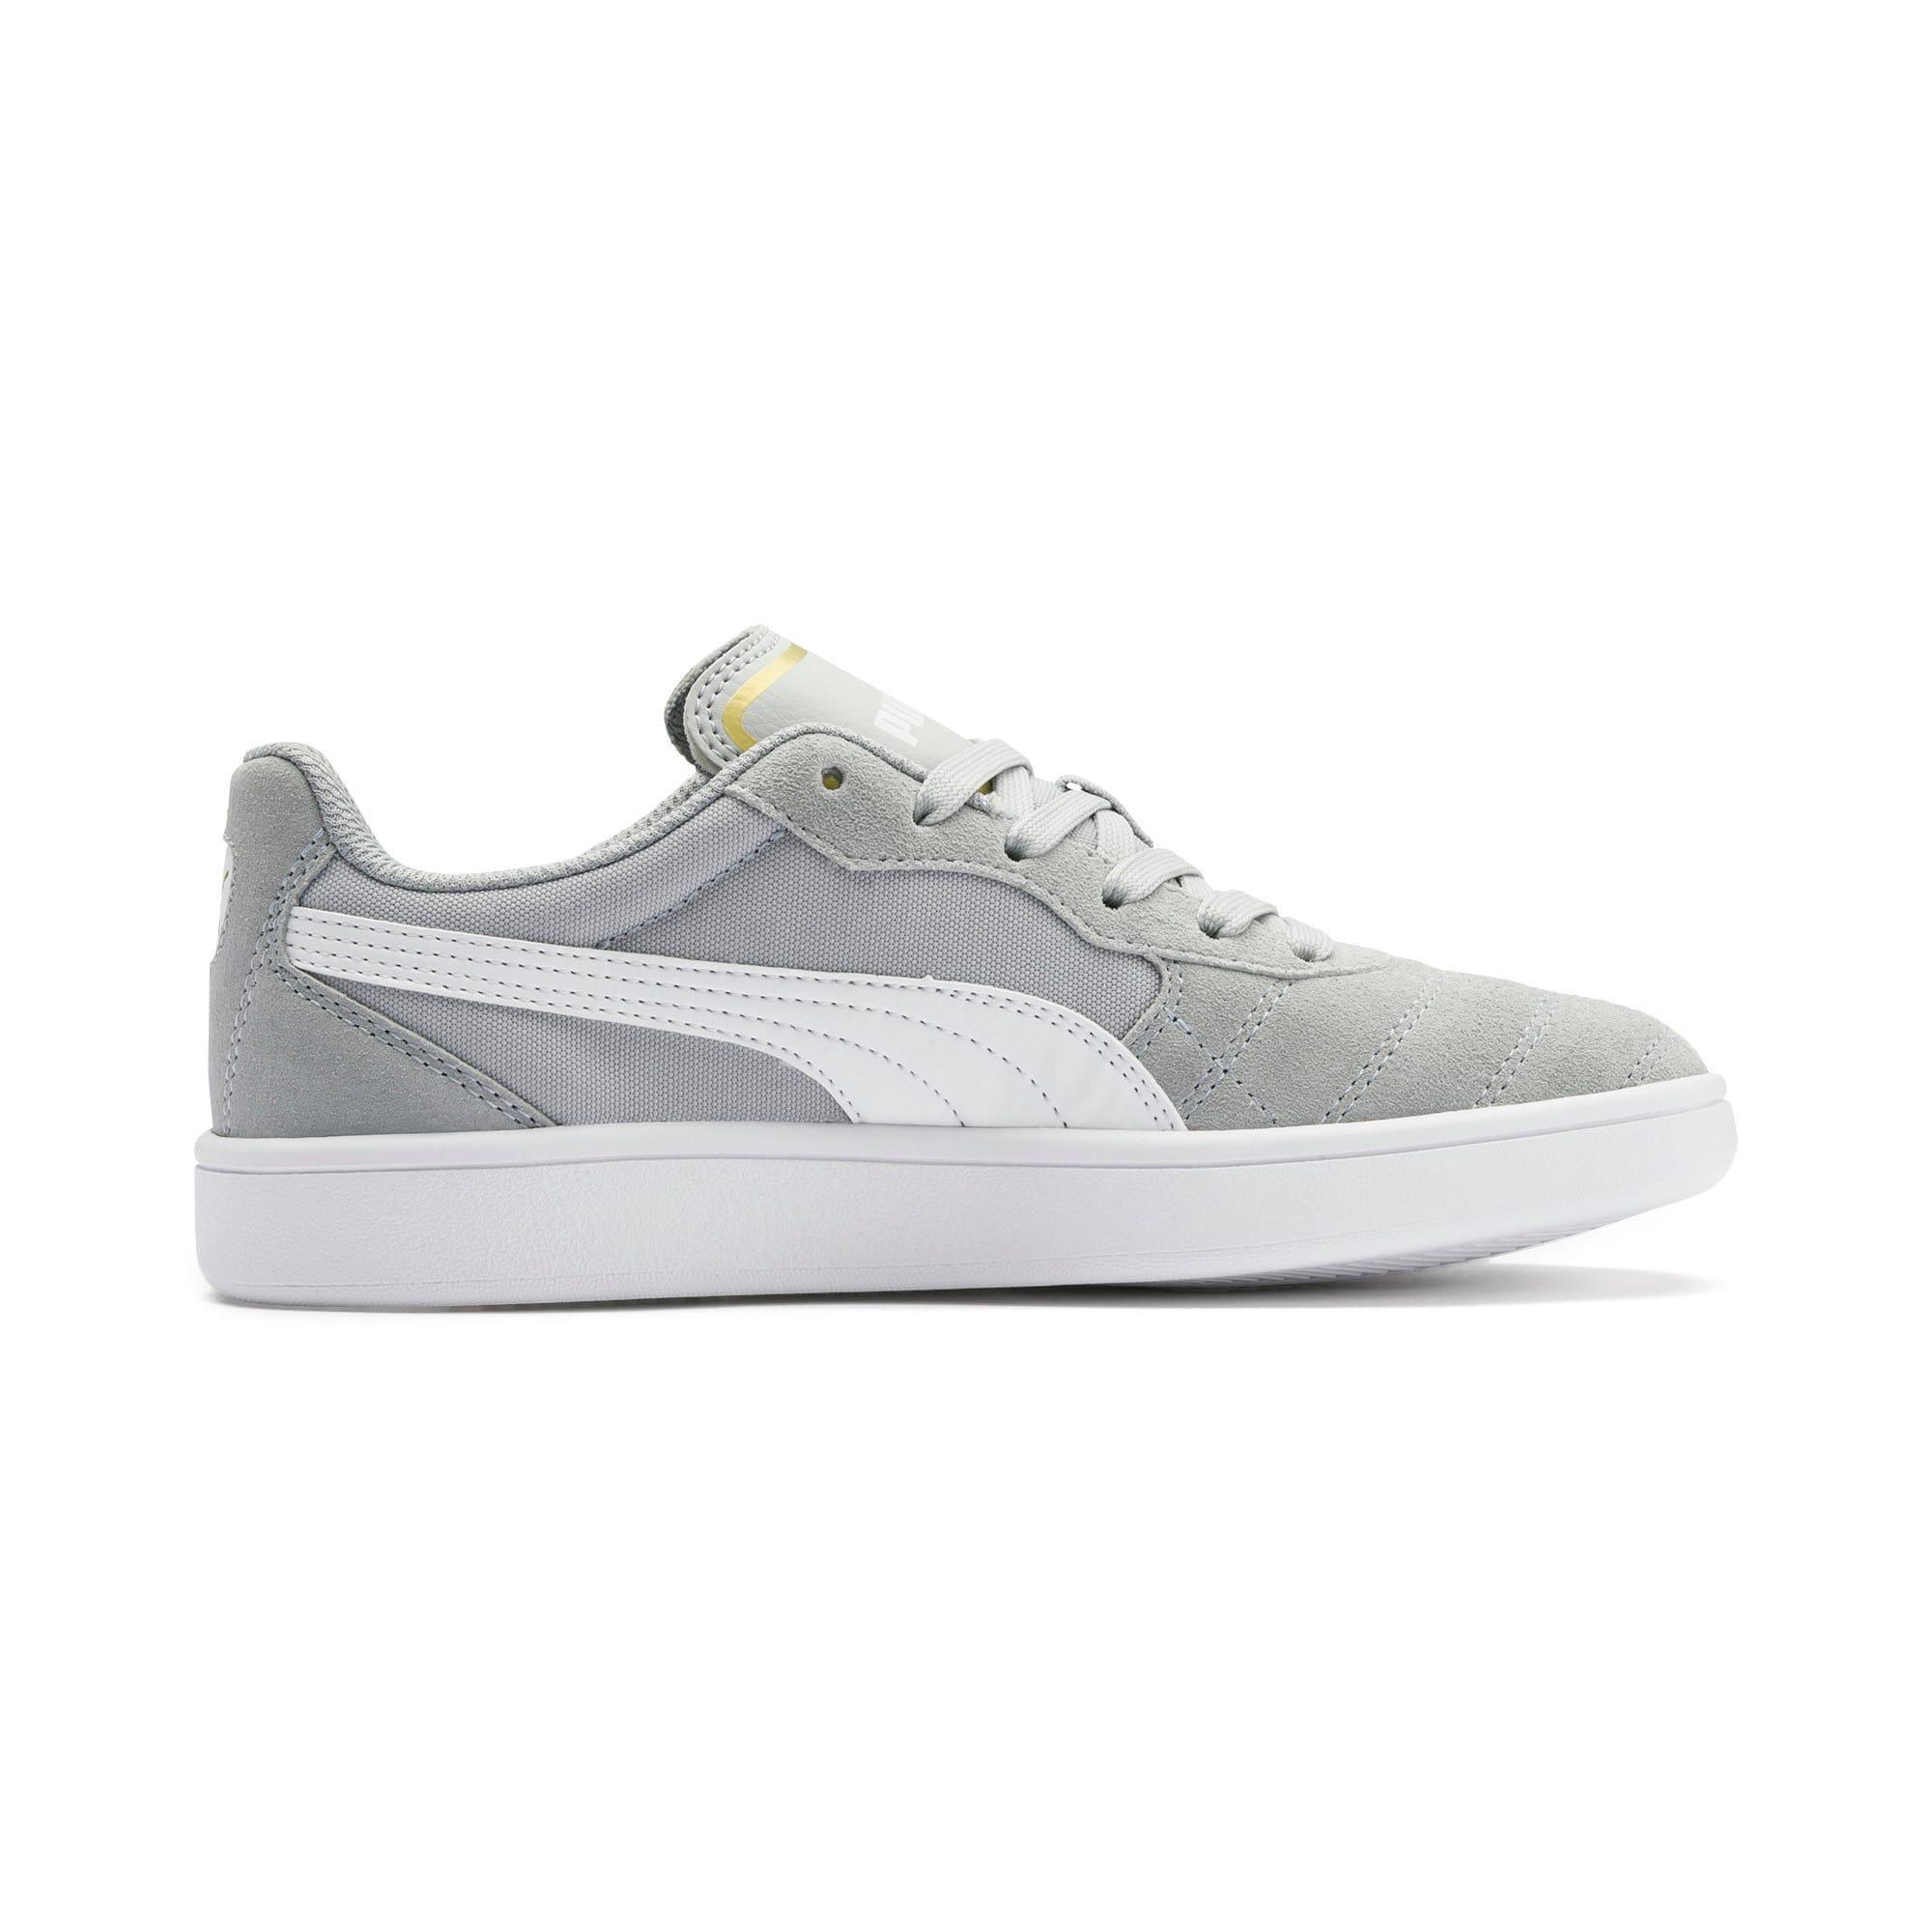 Thumbnail 5 of Astro Kick Sneakers JR, HRise-White-Gold-GViolet-Gum, medium